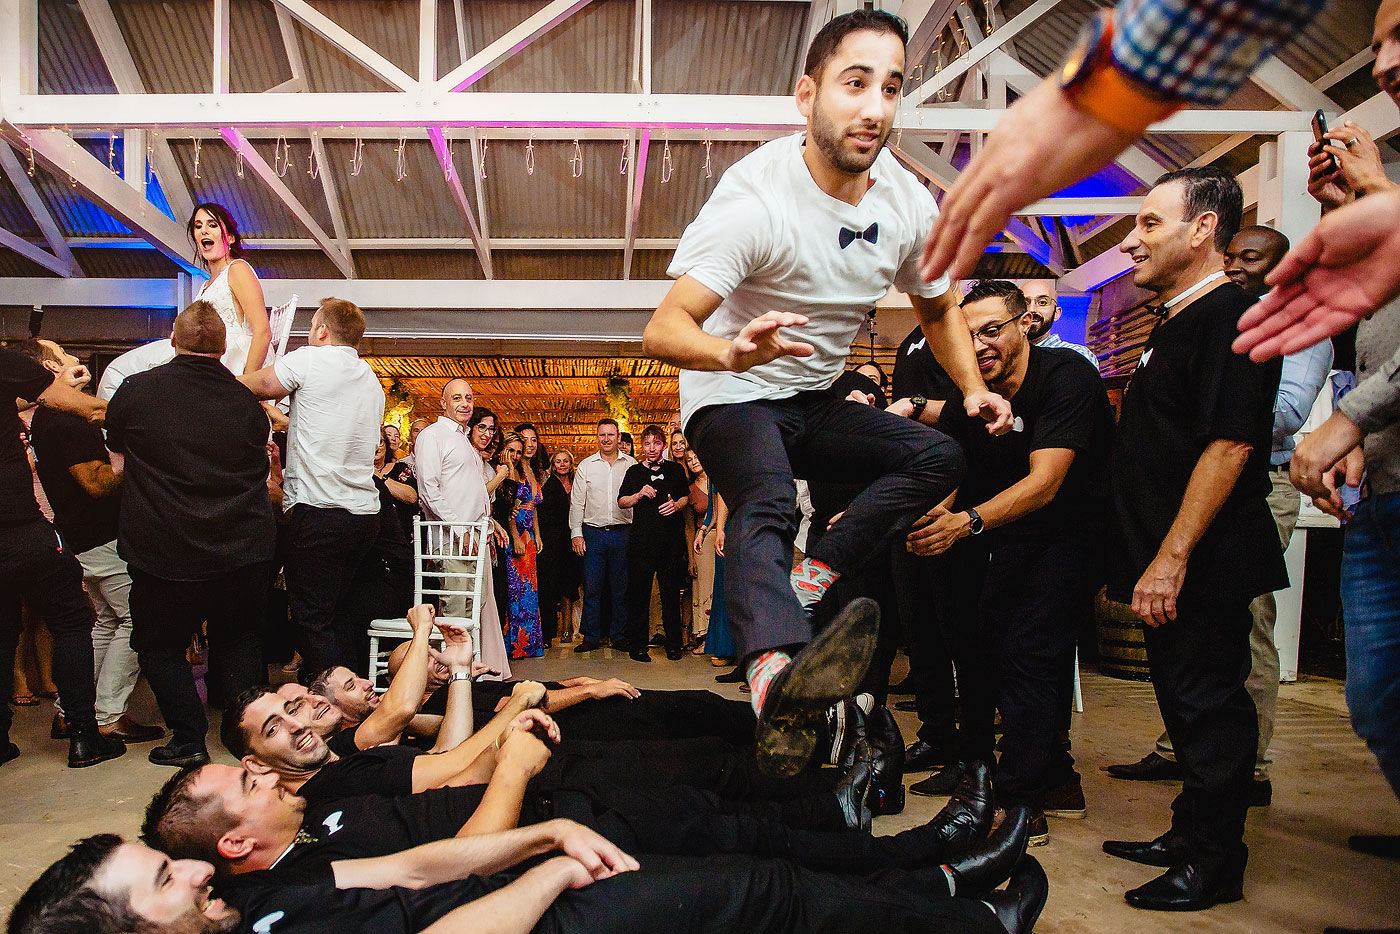 Israeli Dancing fun during Jewish Wedding Reception